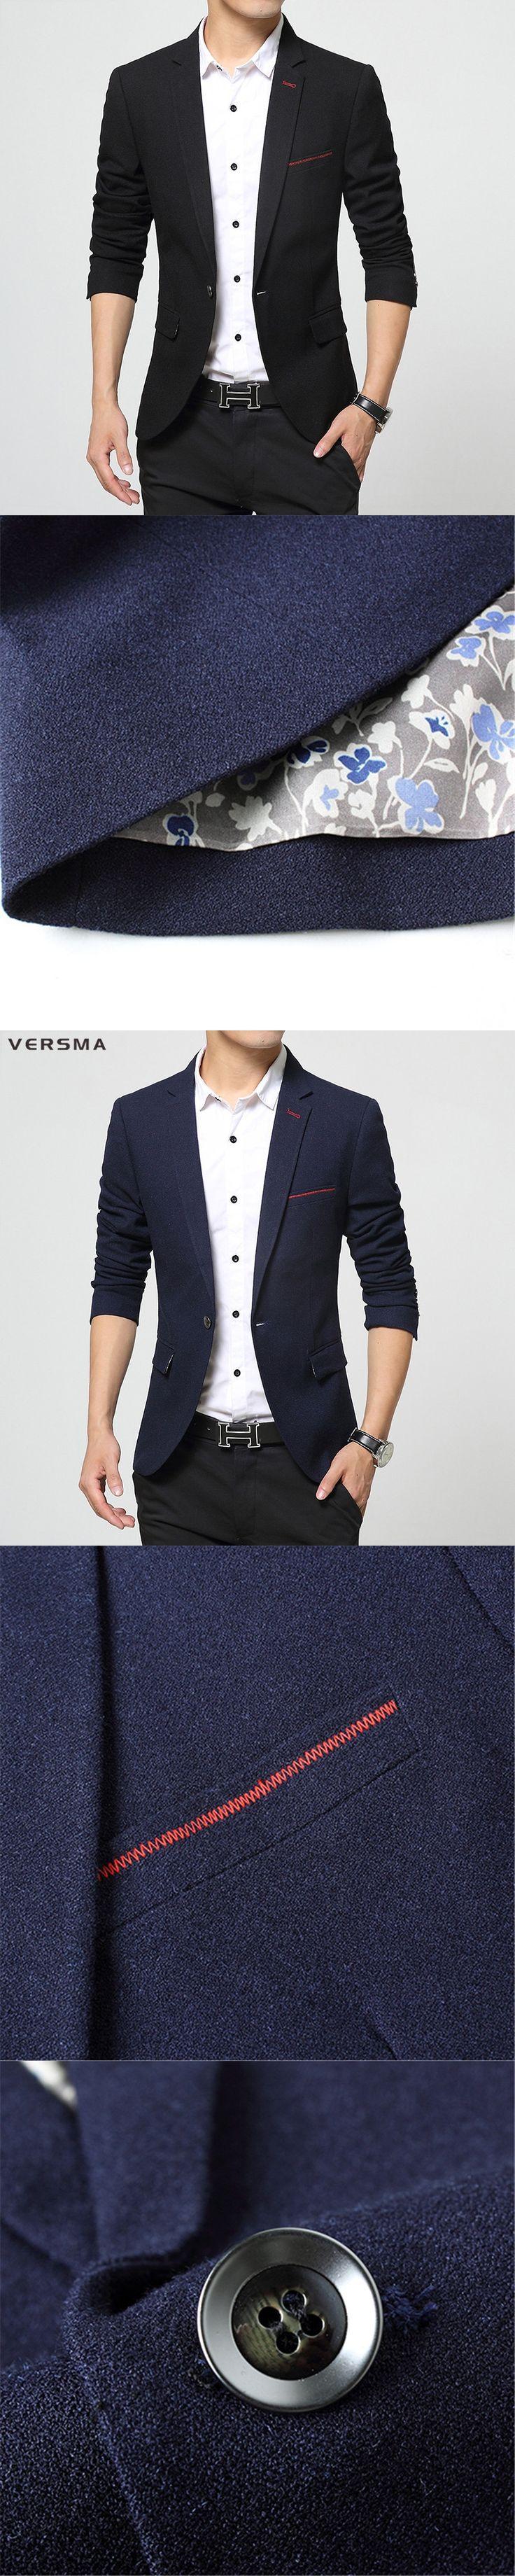 VERSMA 2017 Korean Style Clothing Mens Stylish Blazer Suit Jacket Party Wear Fitted Royal Blue Designer Mens Blazer for Boys 3XL